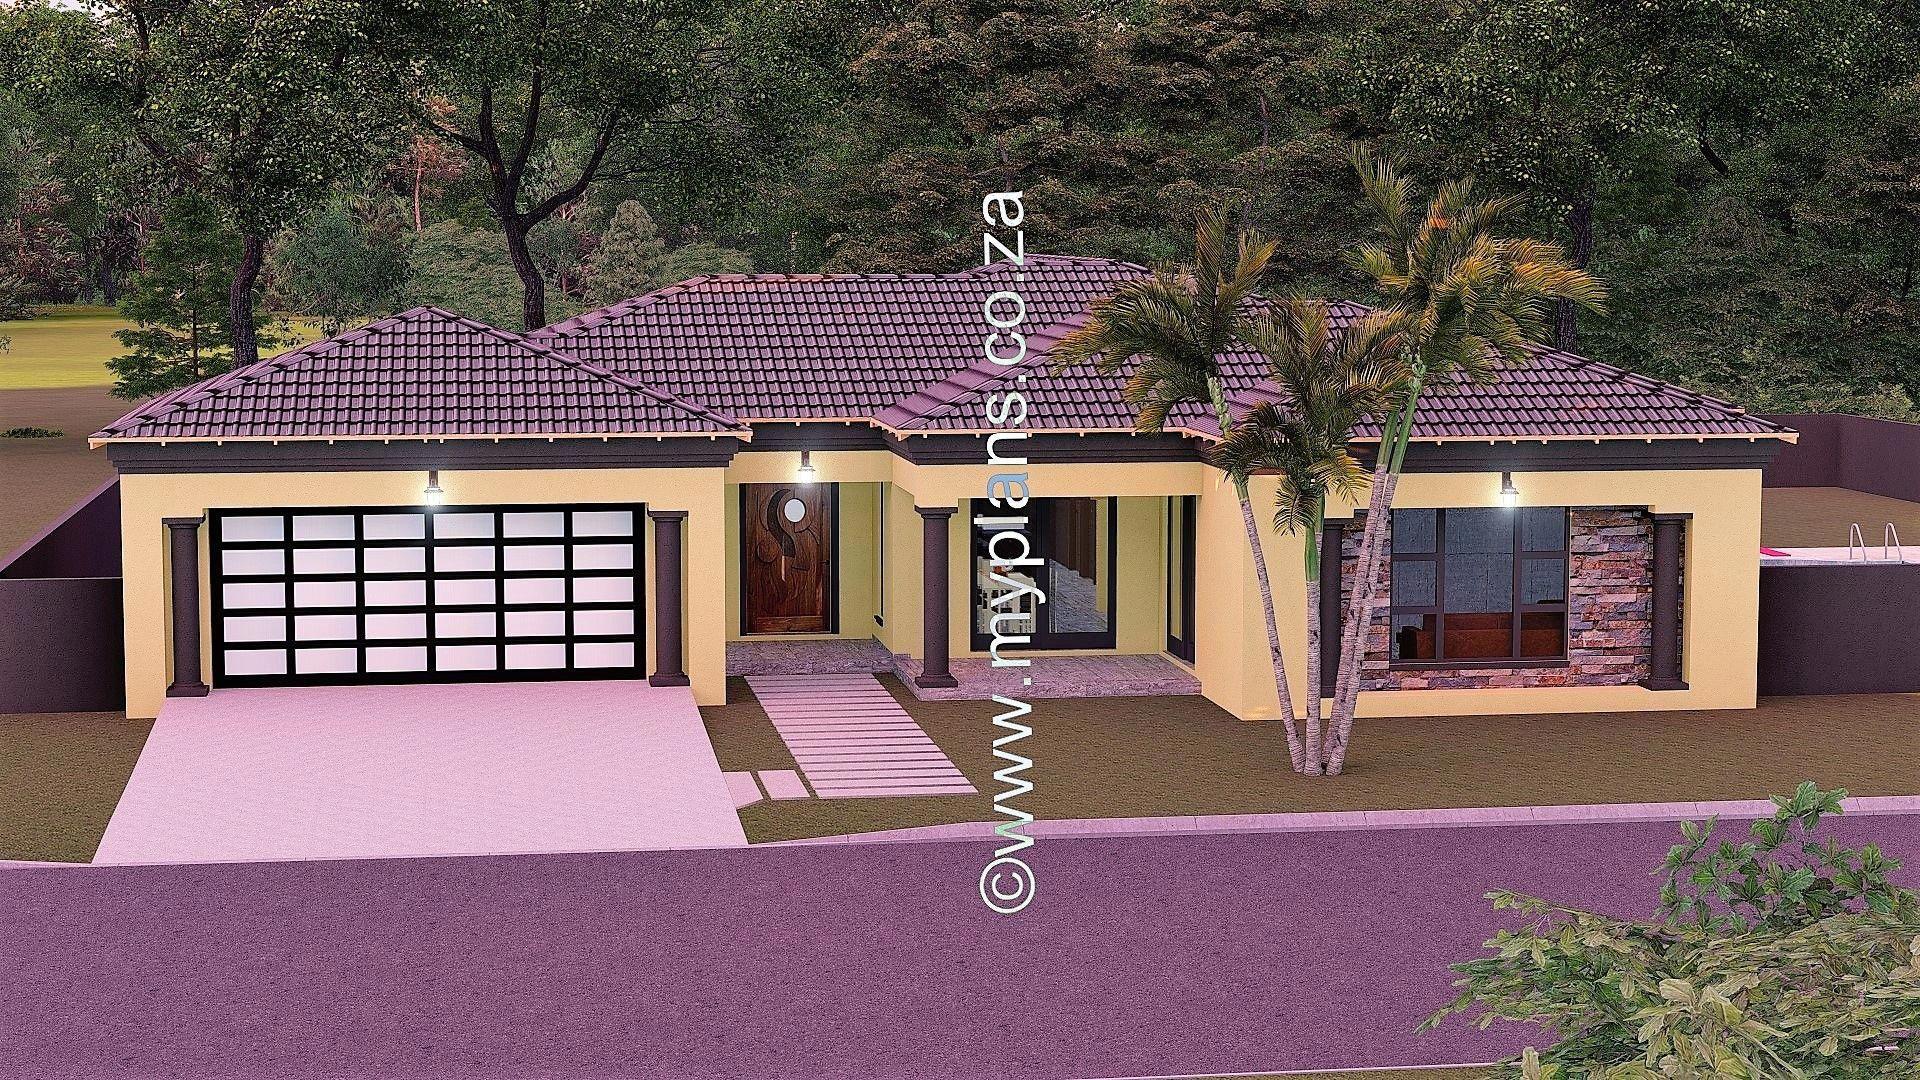 RusticHomeDecorItalian in 2020 4 bedroom house plans